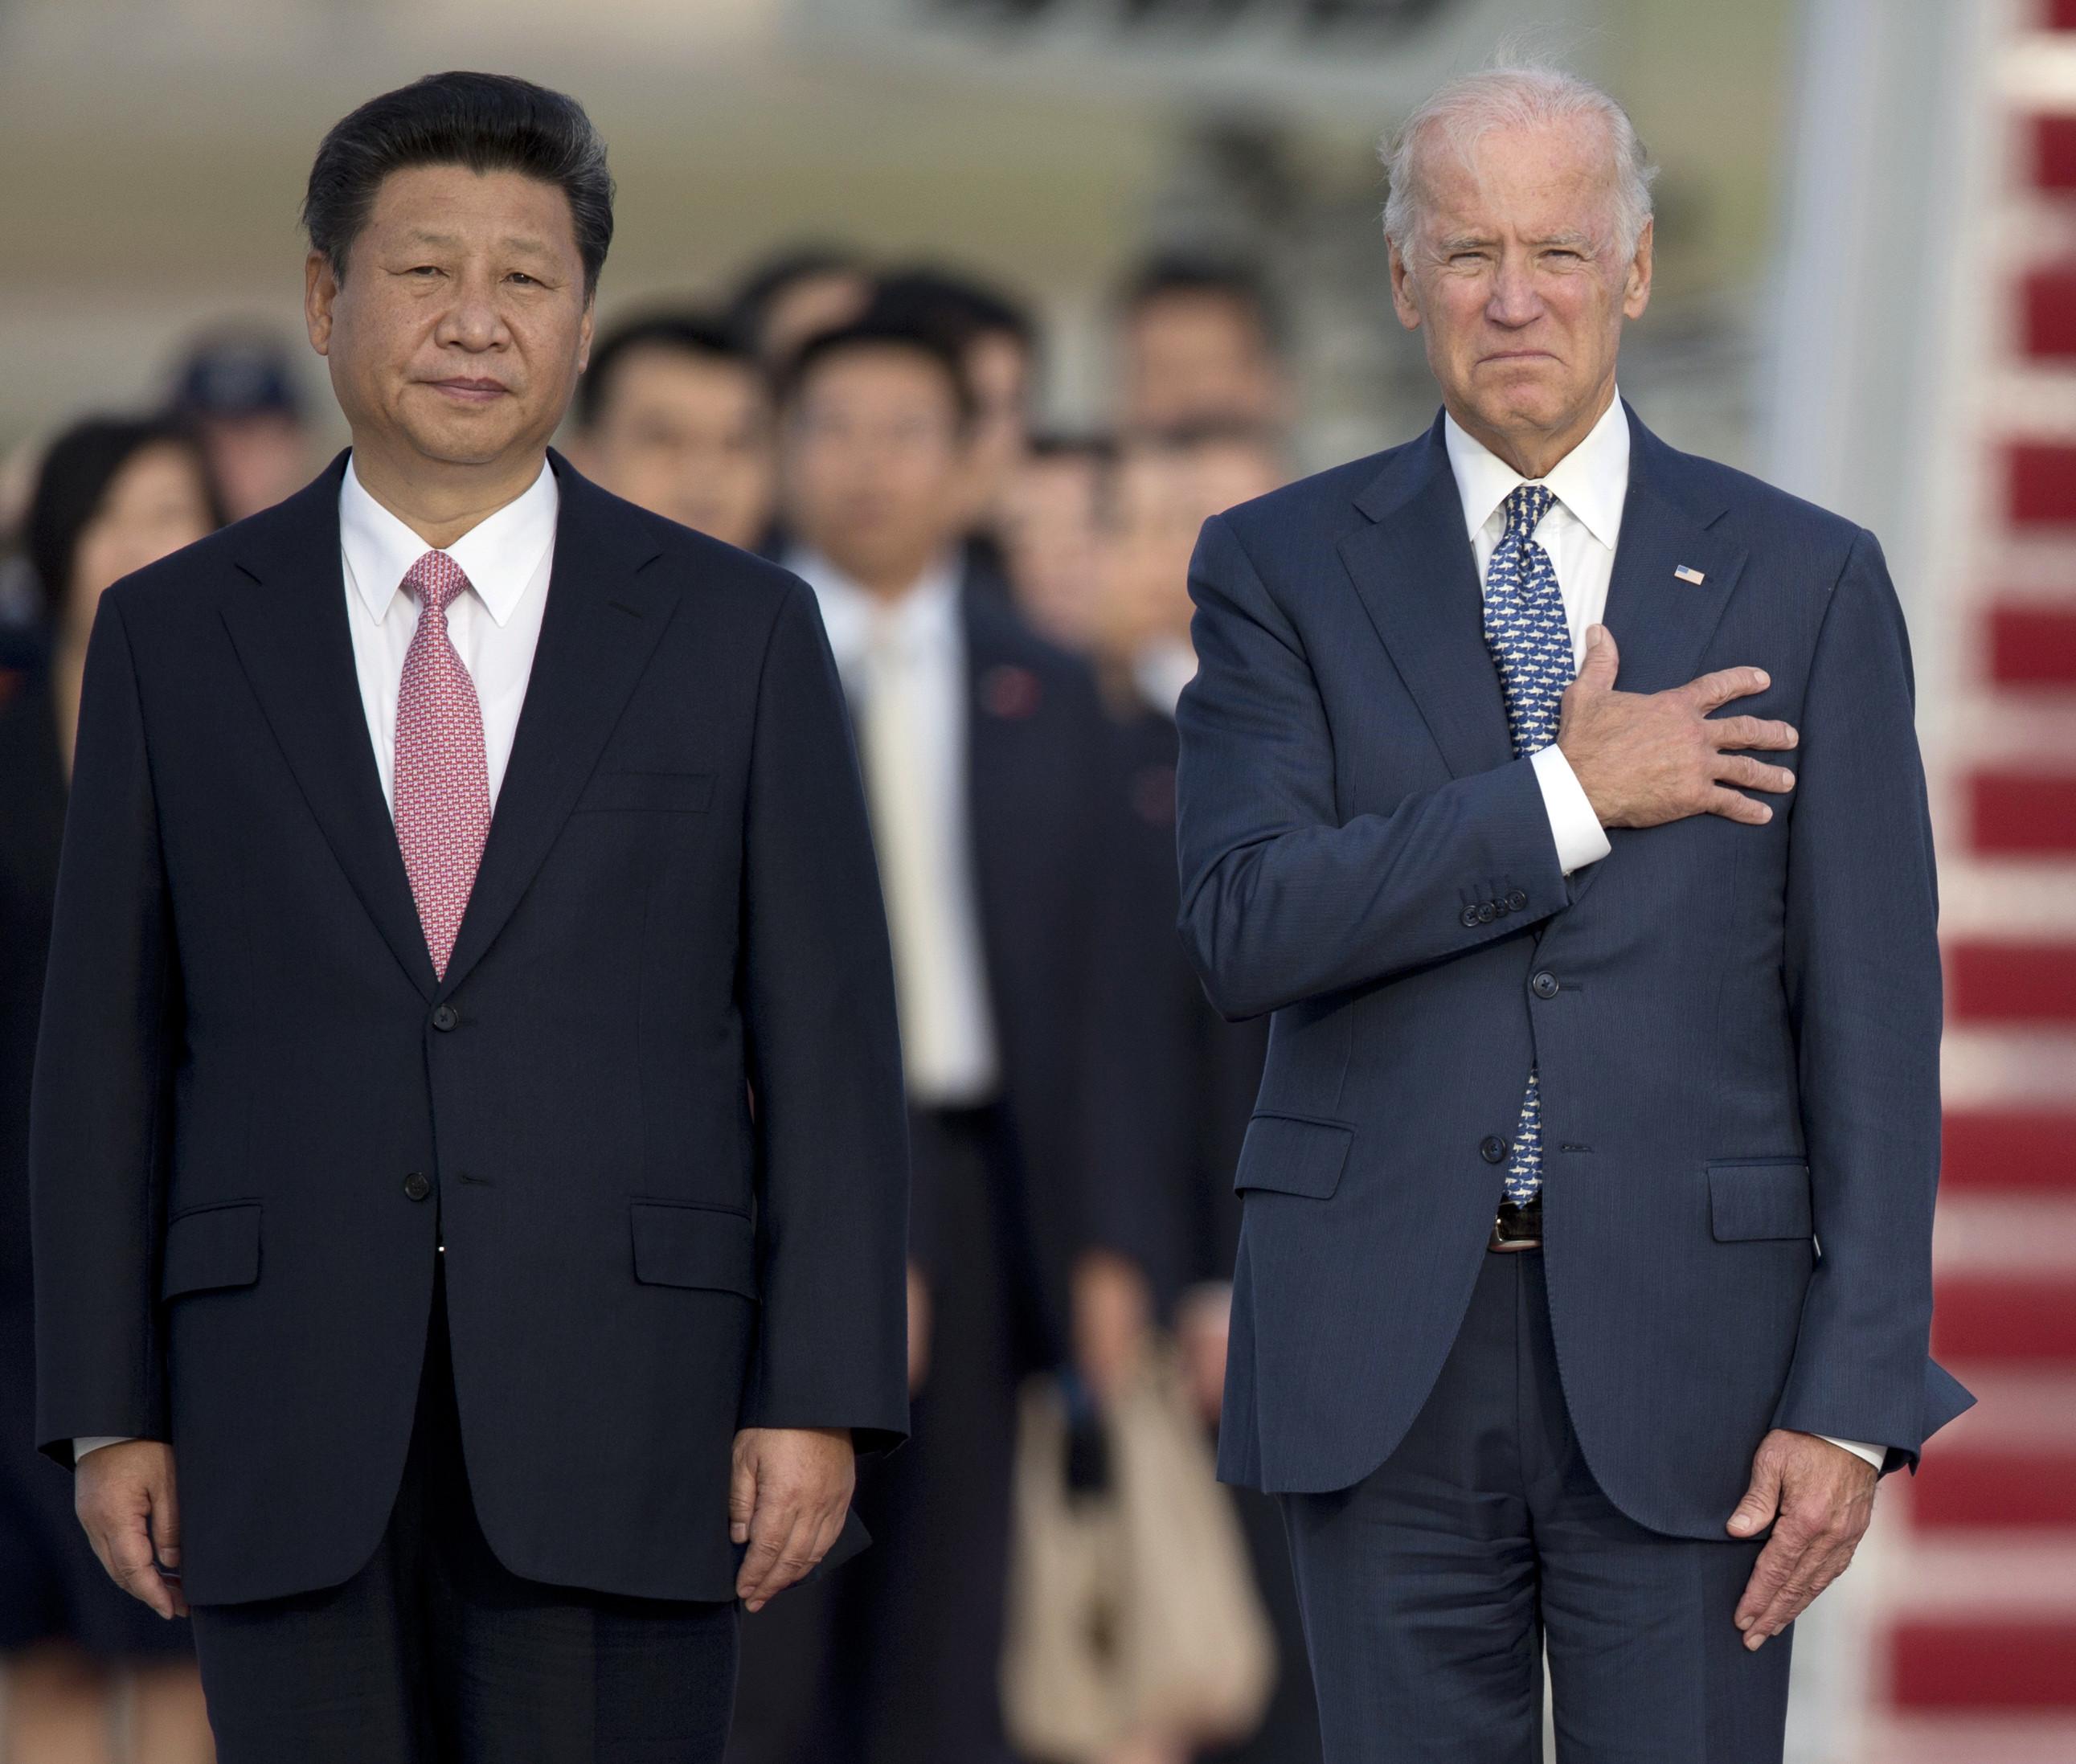 G20,新冷戰,布林肯,拜登,習近平,美中關係,零和遊戲,貿易